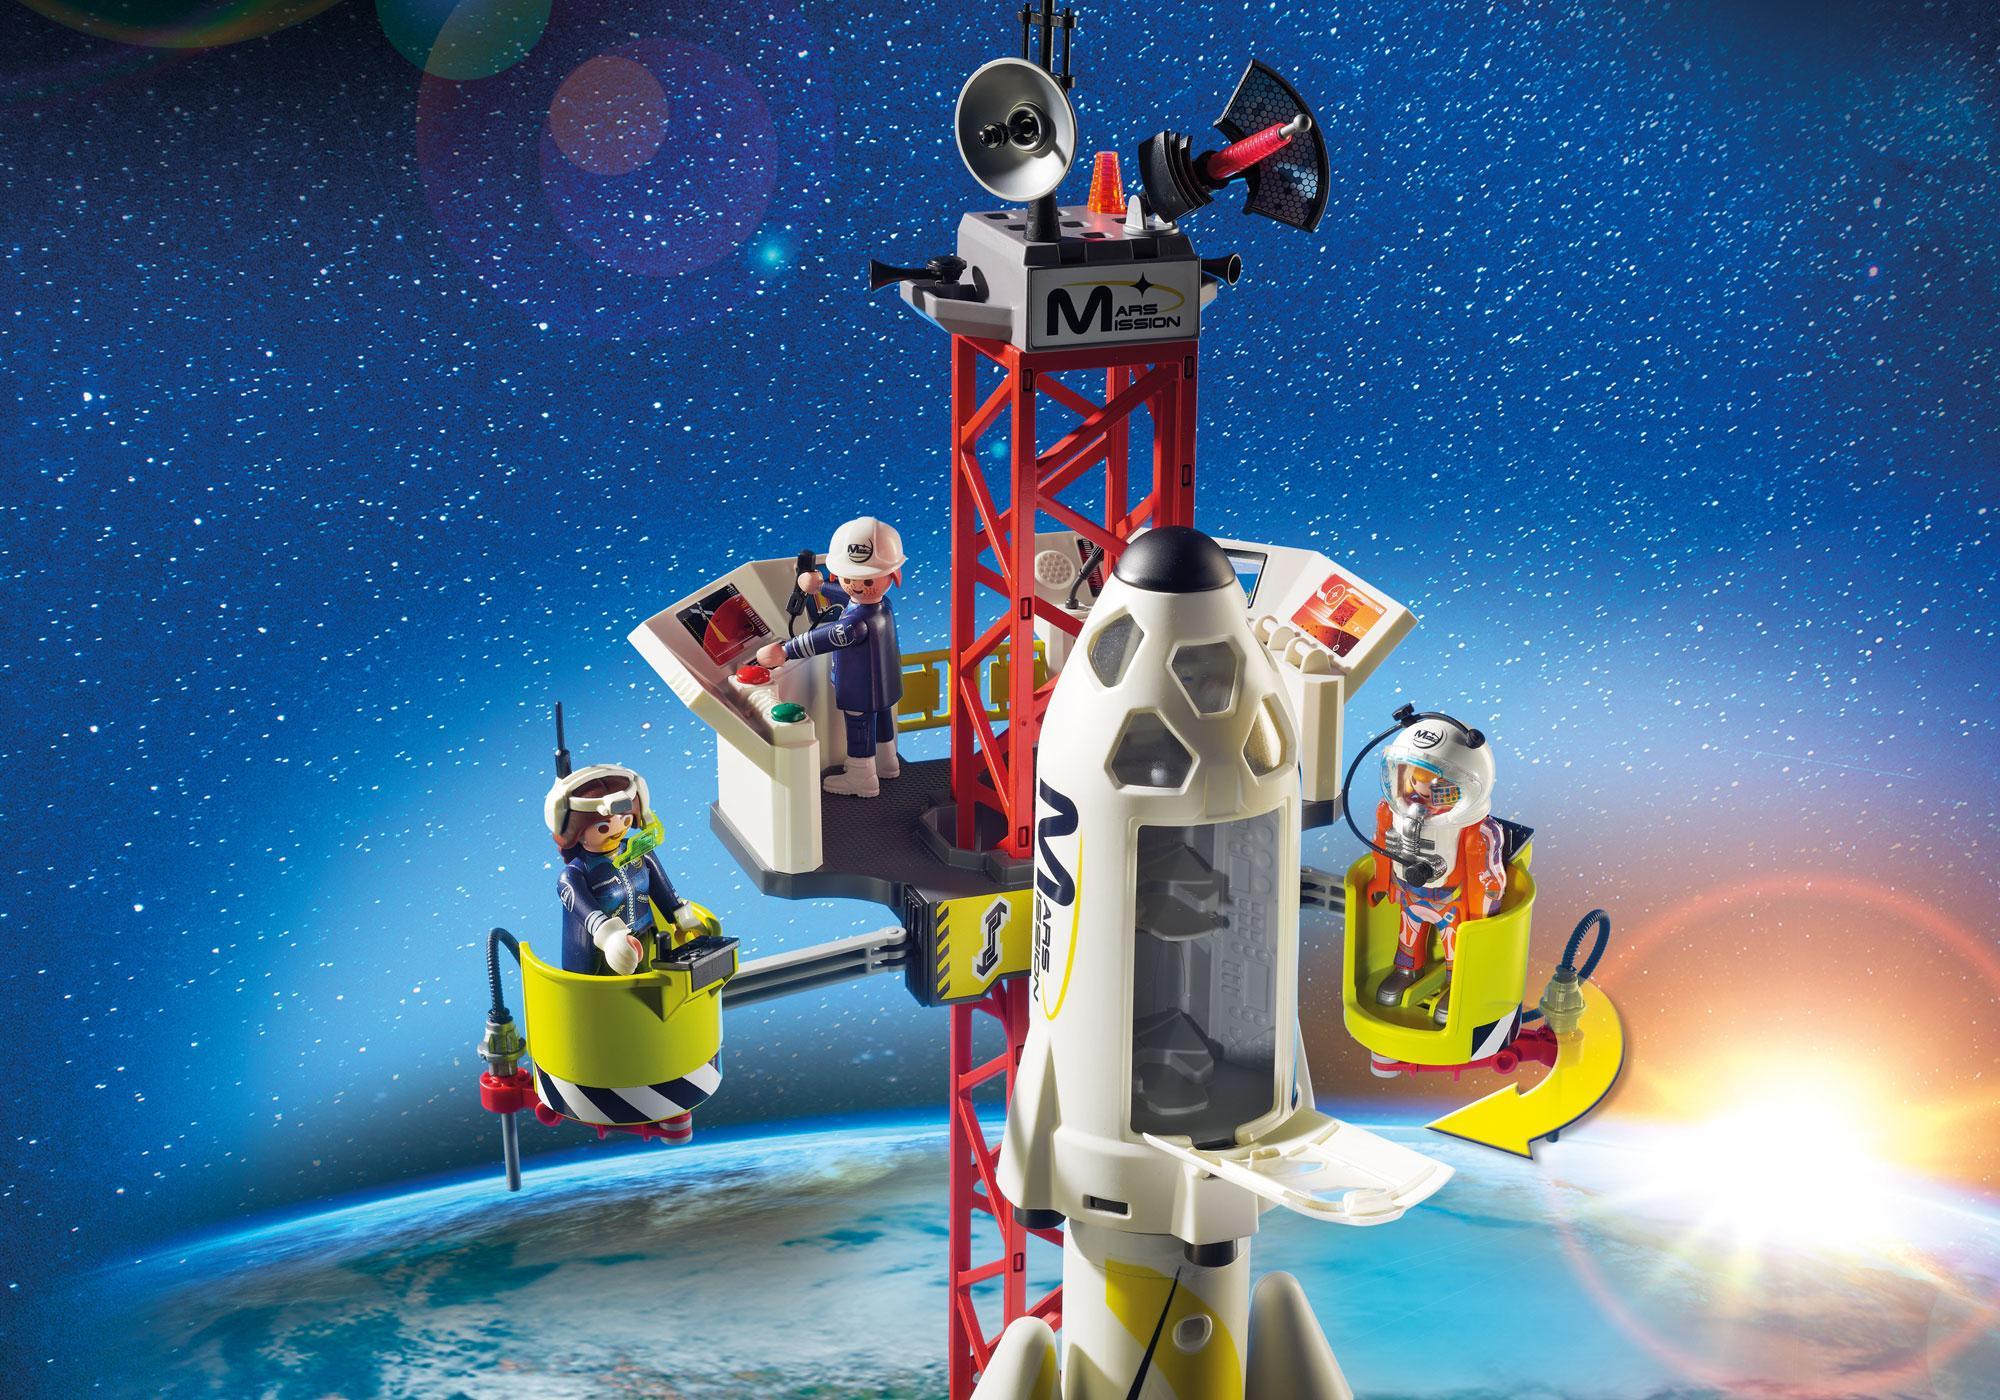 http://media.playmobil.com/i/playmobil/9488_product_extra1/Razzo spaziale con rampa di lancio